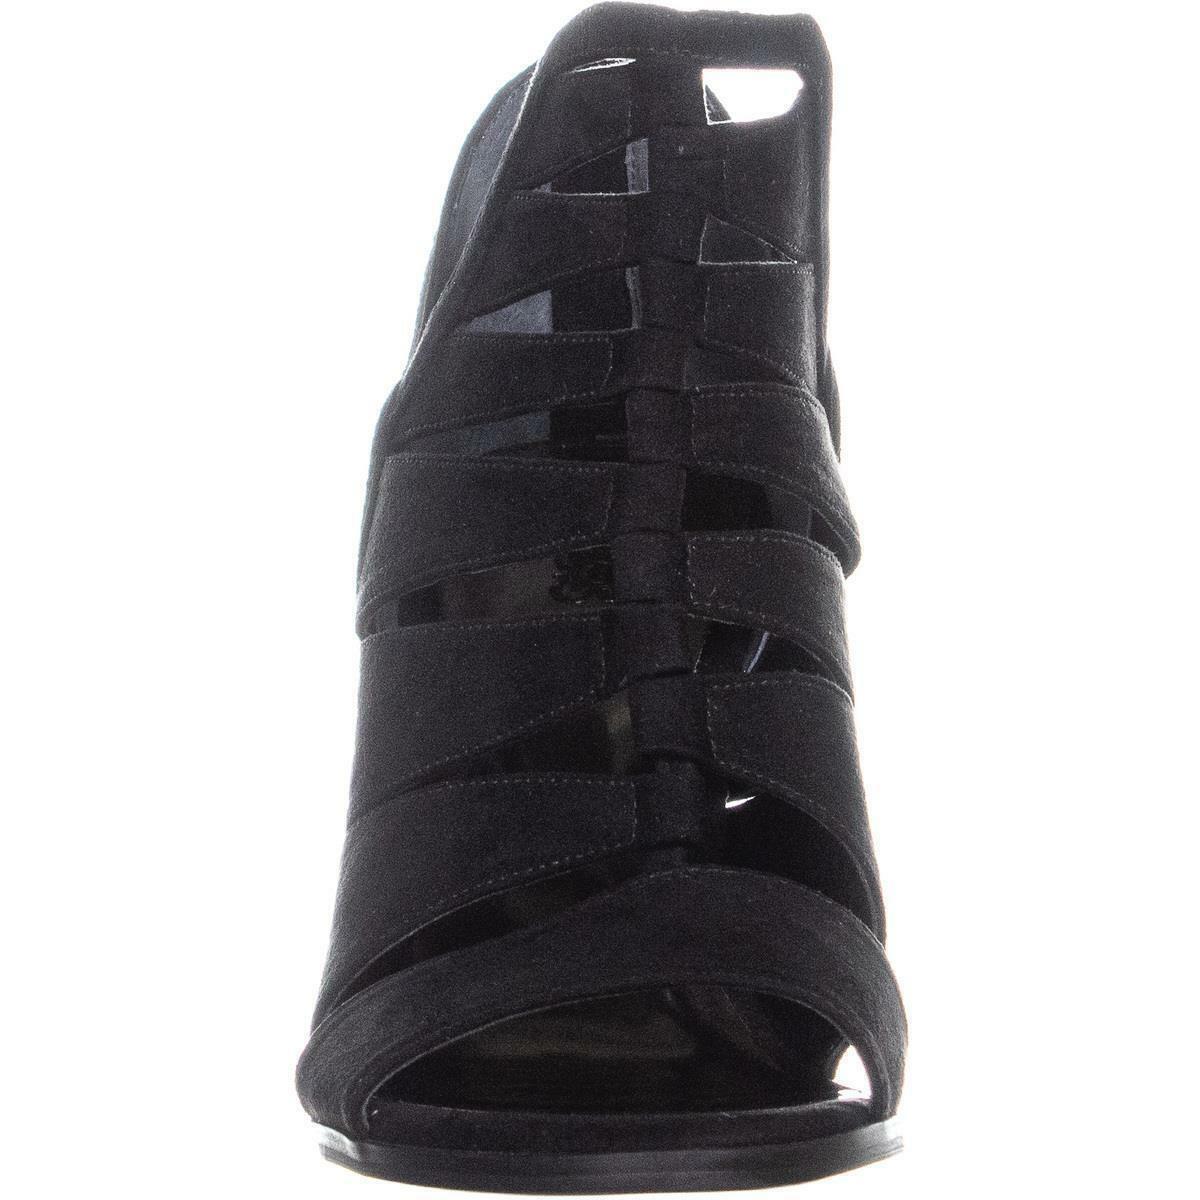 Carlos by Carlos Santana Solera Dress Sandals Black 10M Cut Out Strappy NIB S24